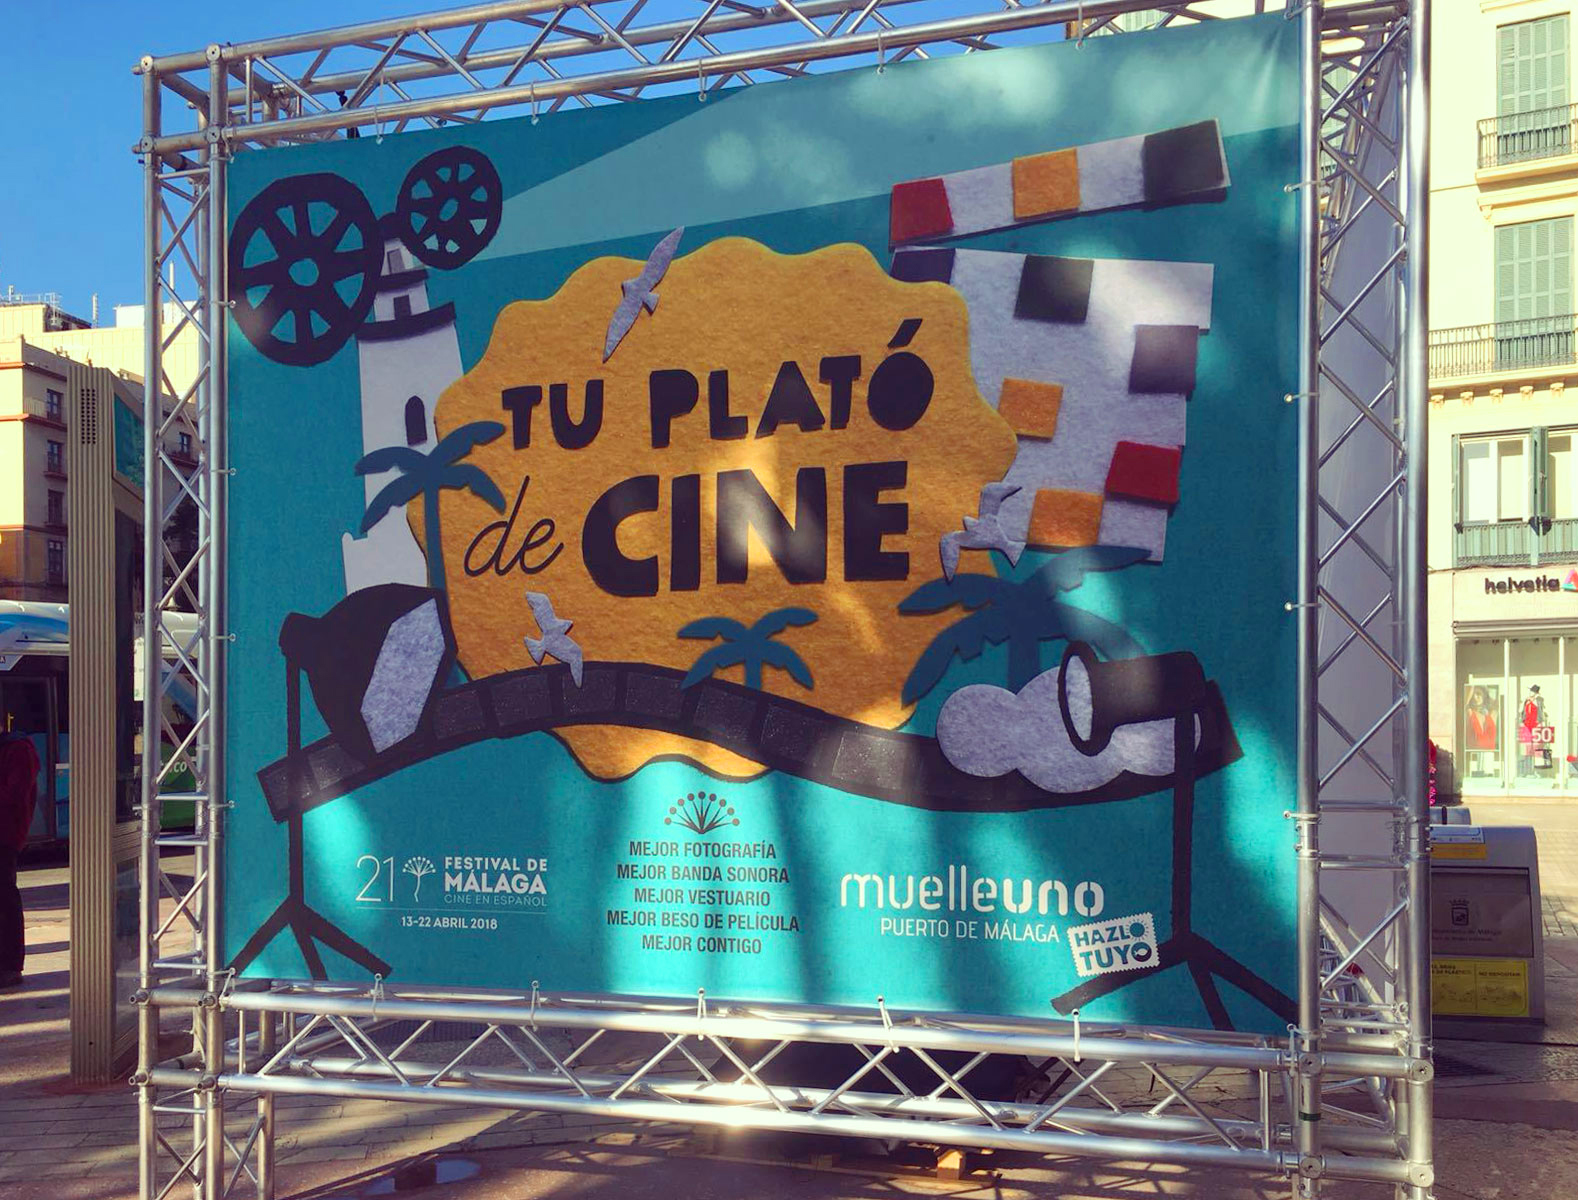 festivalcine_lamadredelosbeatles3a